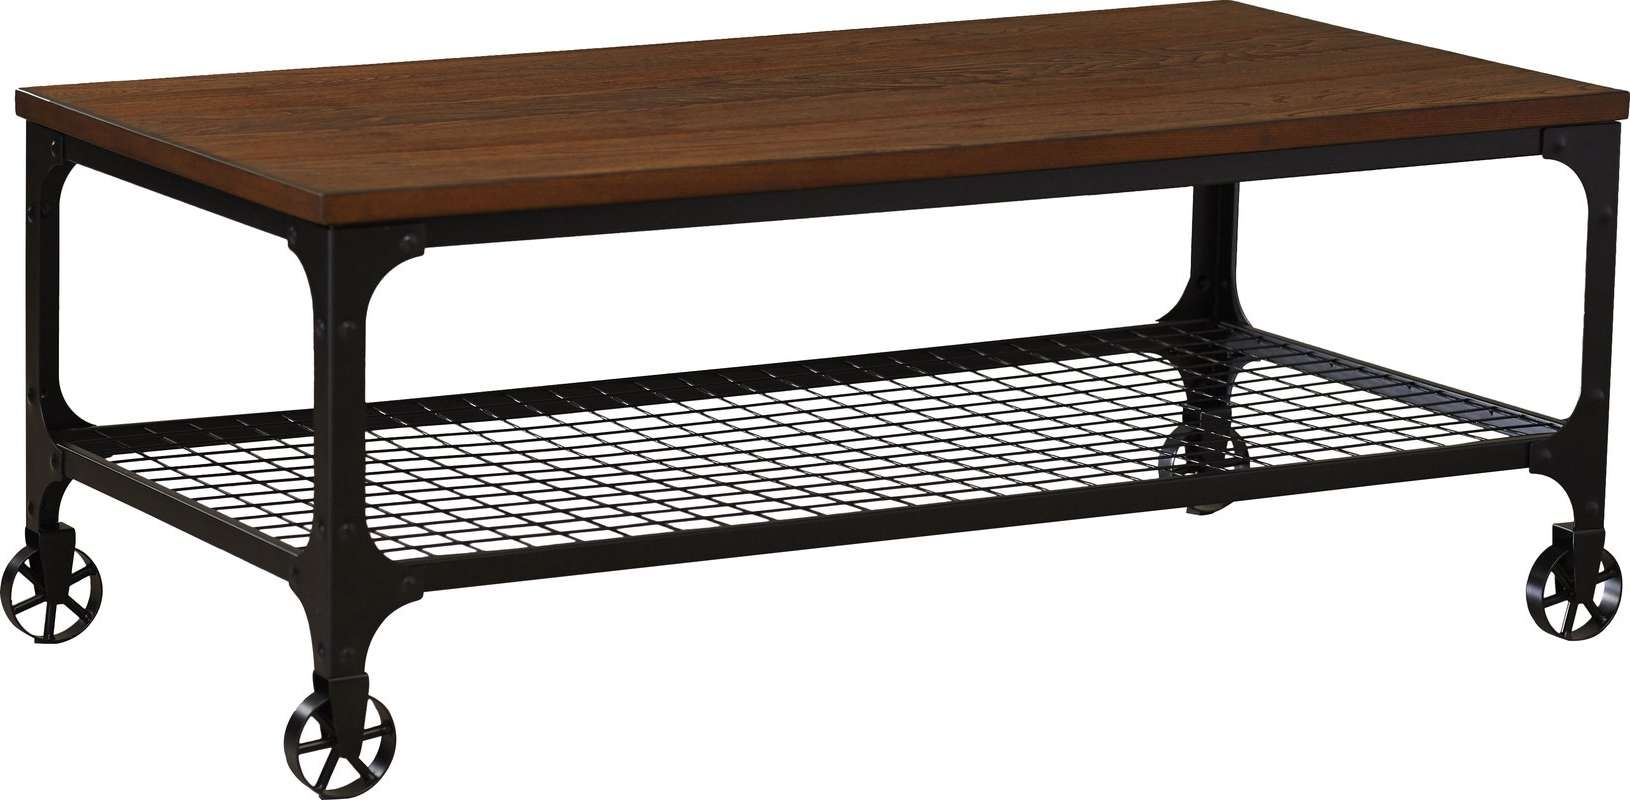 Mercury Row Corvus Rectangle Industrial Coffee Table & Reviews For Fashionable Industrial Coffee Tables (View 14 of 20)